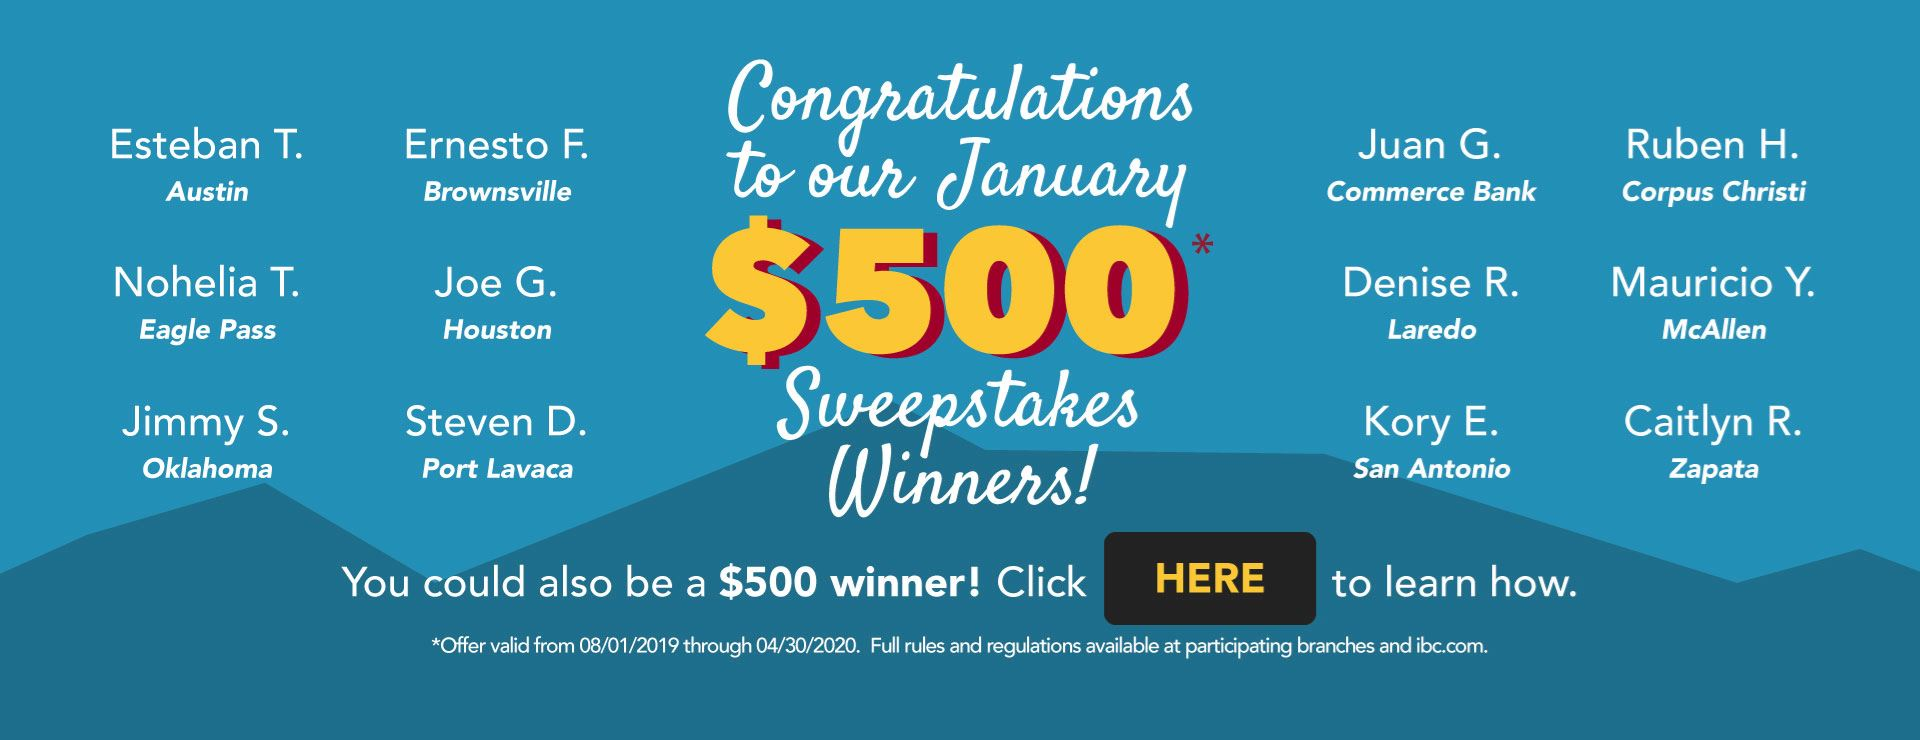 February 2020 - Sweepstakes Winners